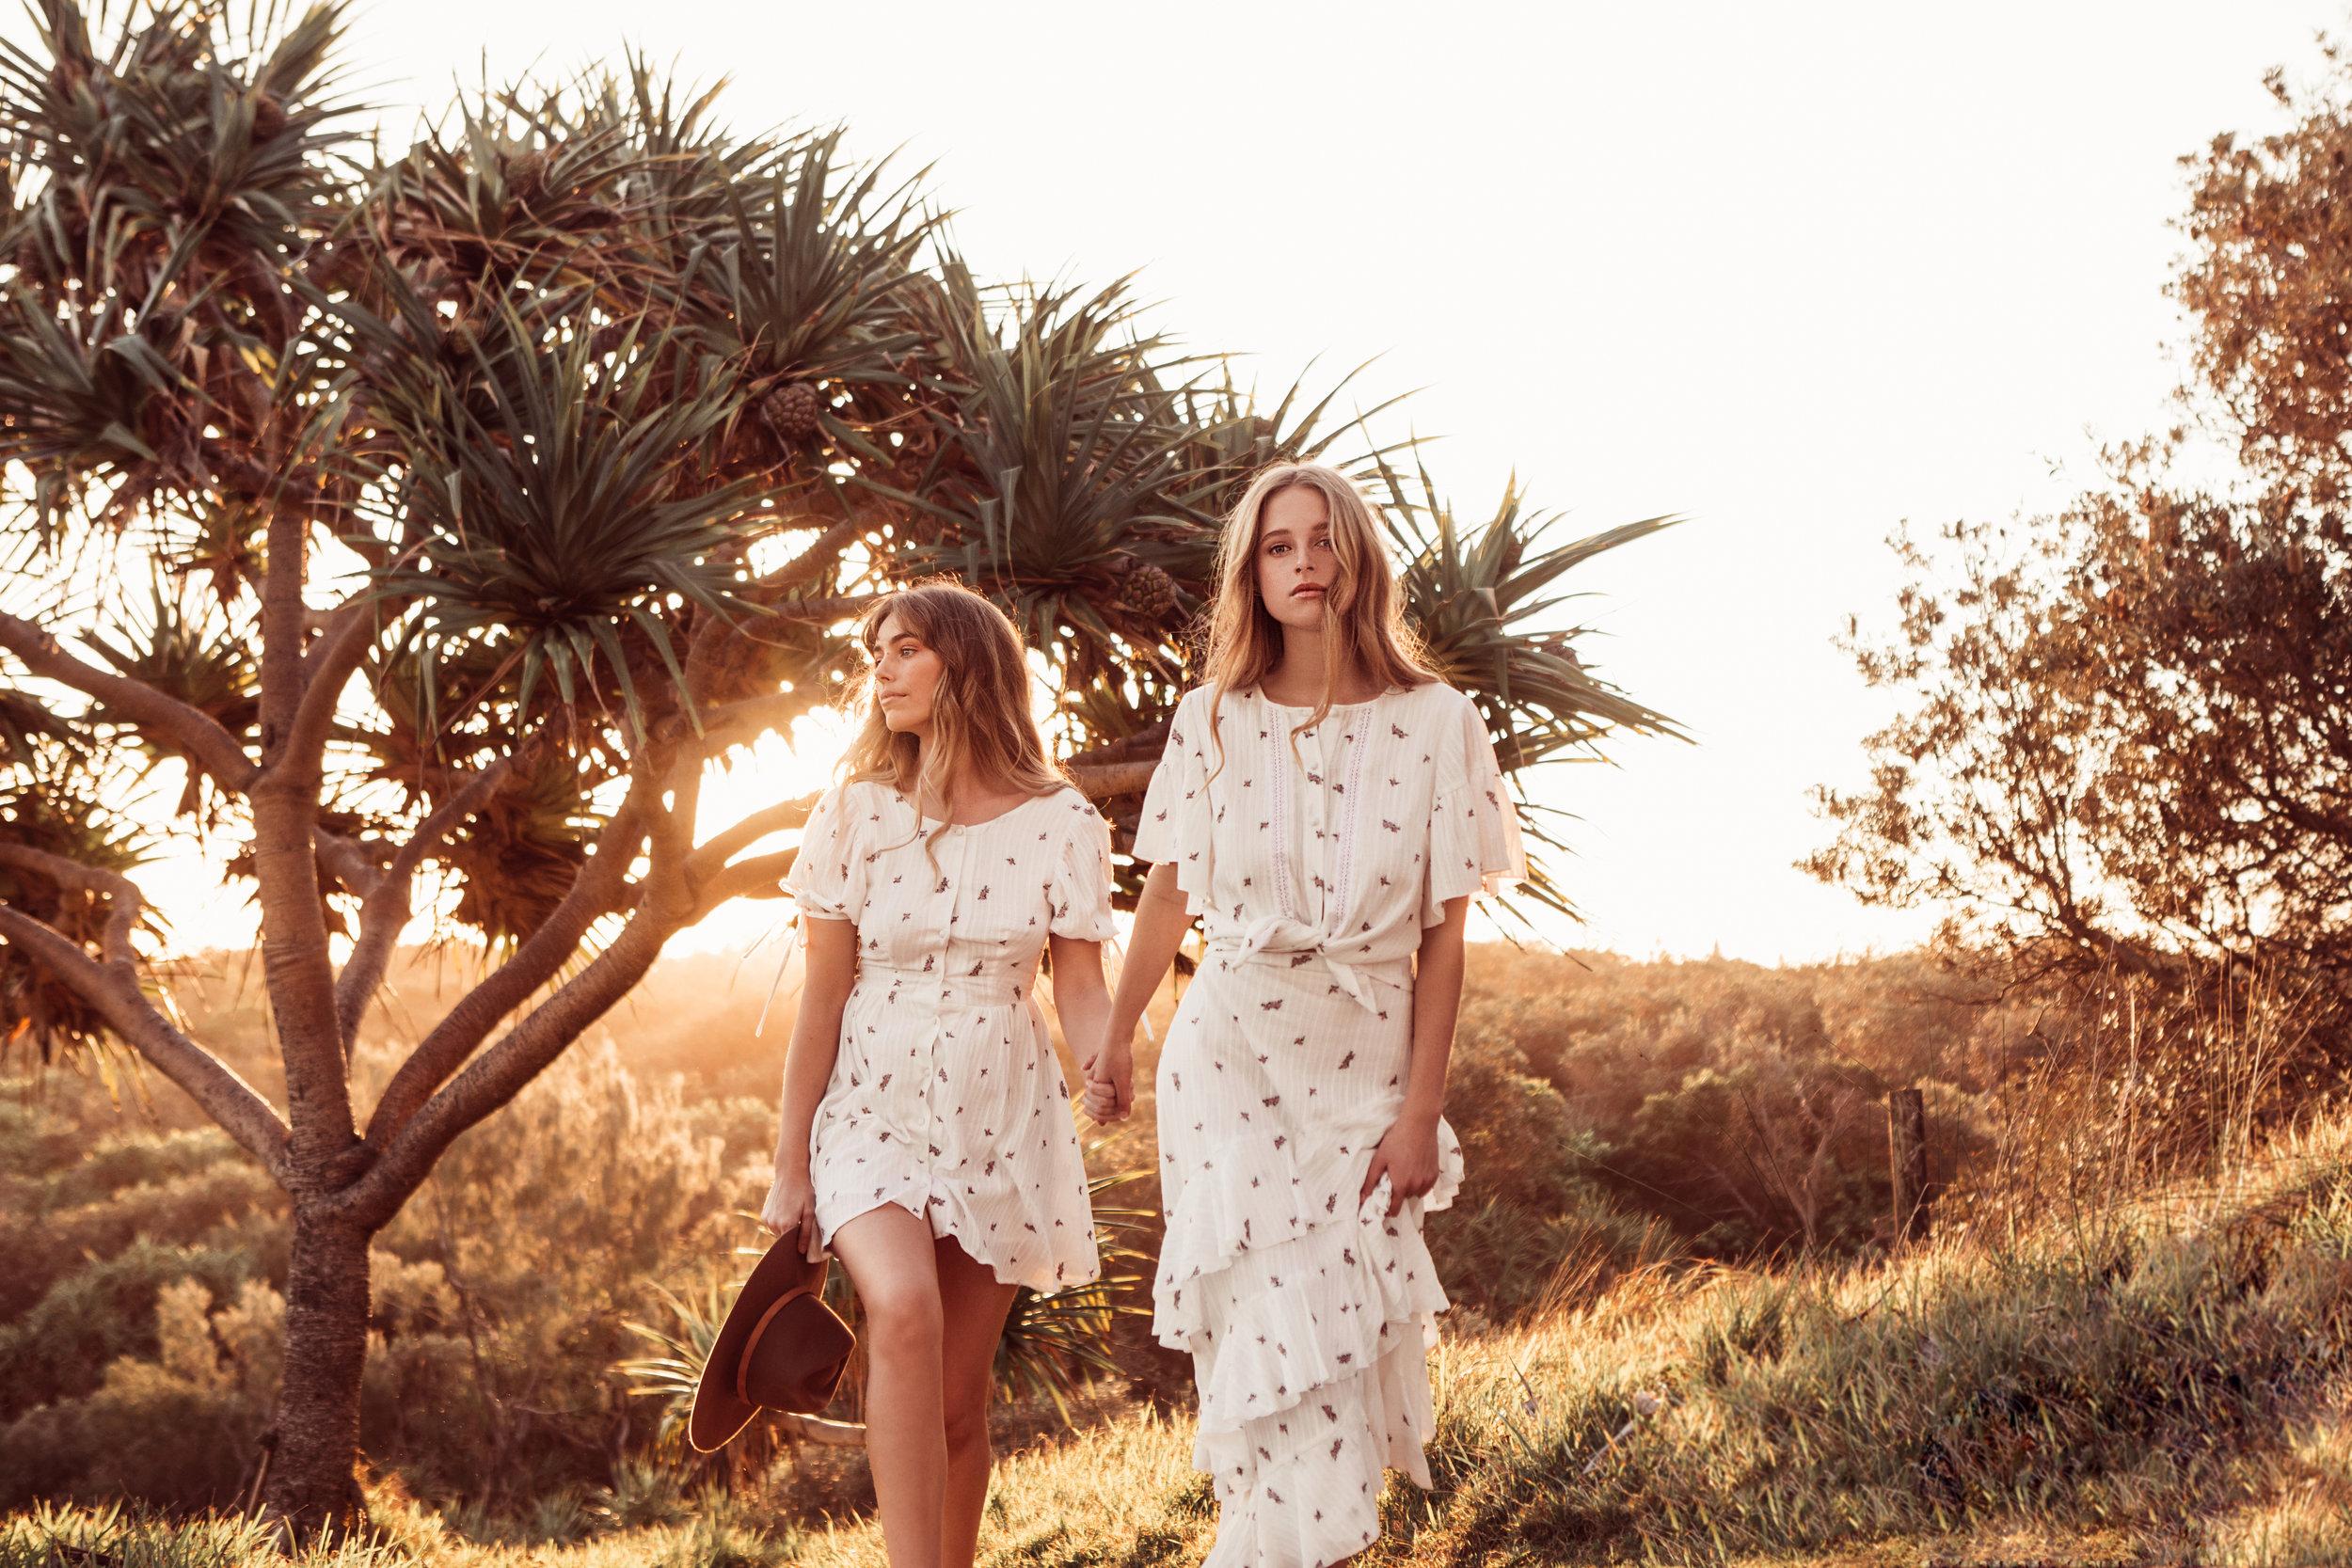 Wilde Willow Summer 2018 Beach by Anne Carolien Kohler 85.jpg